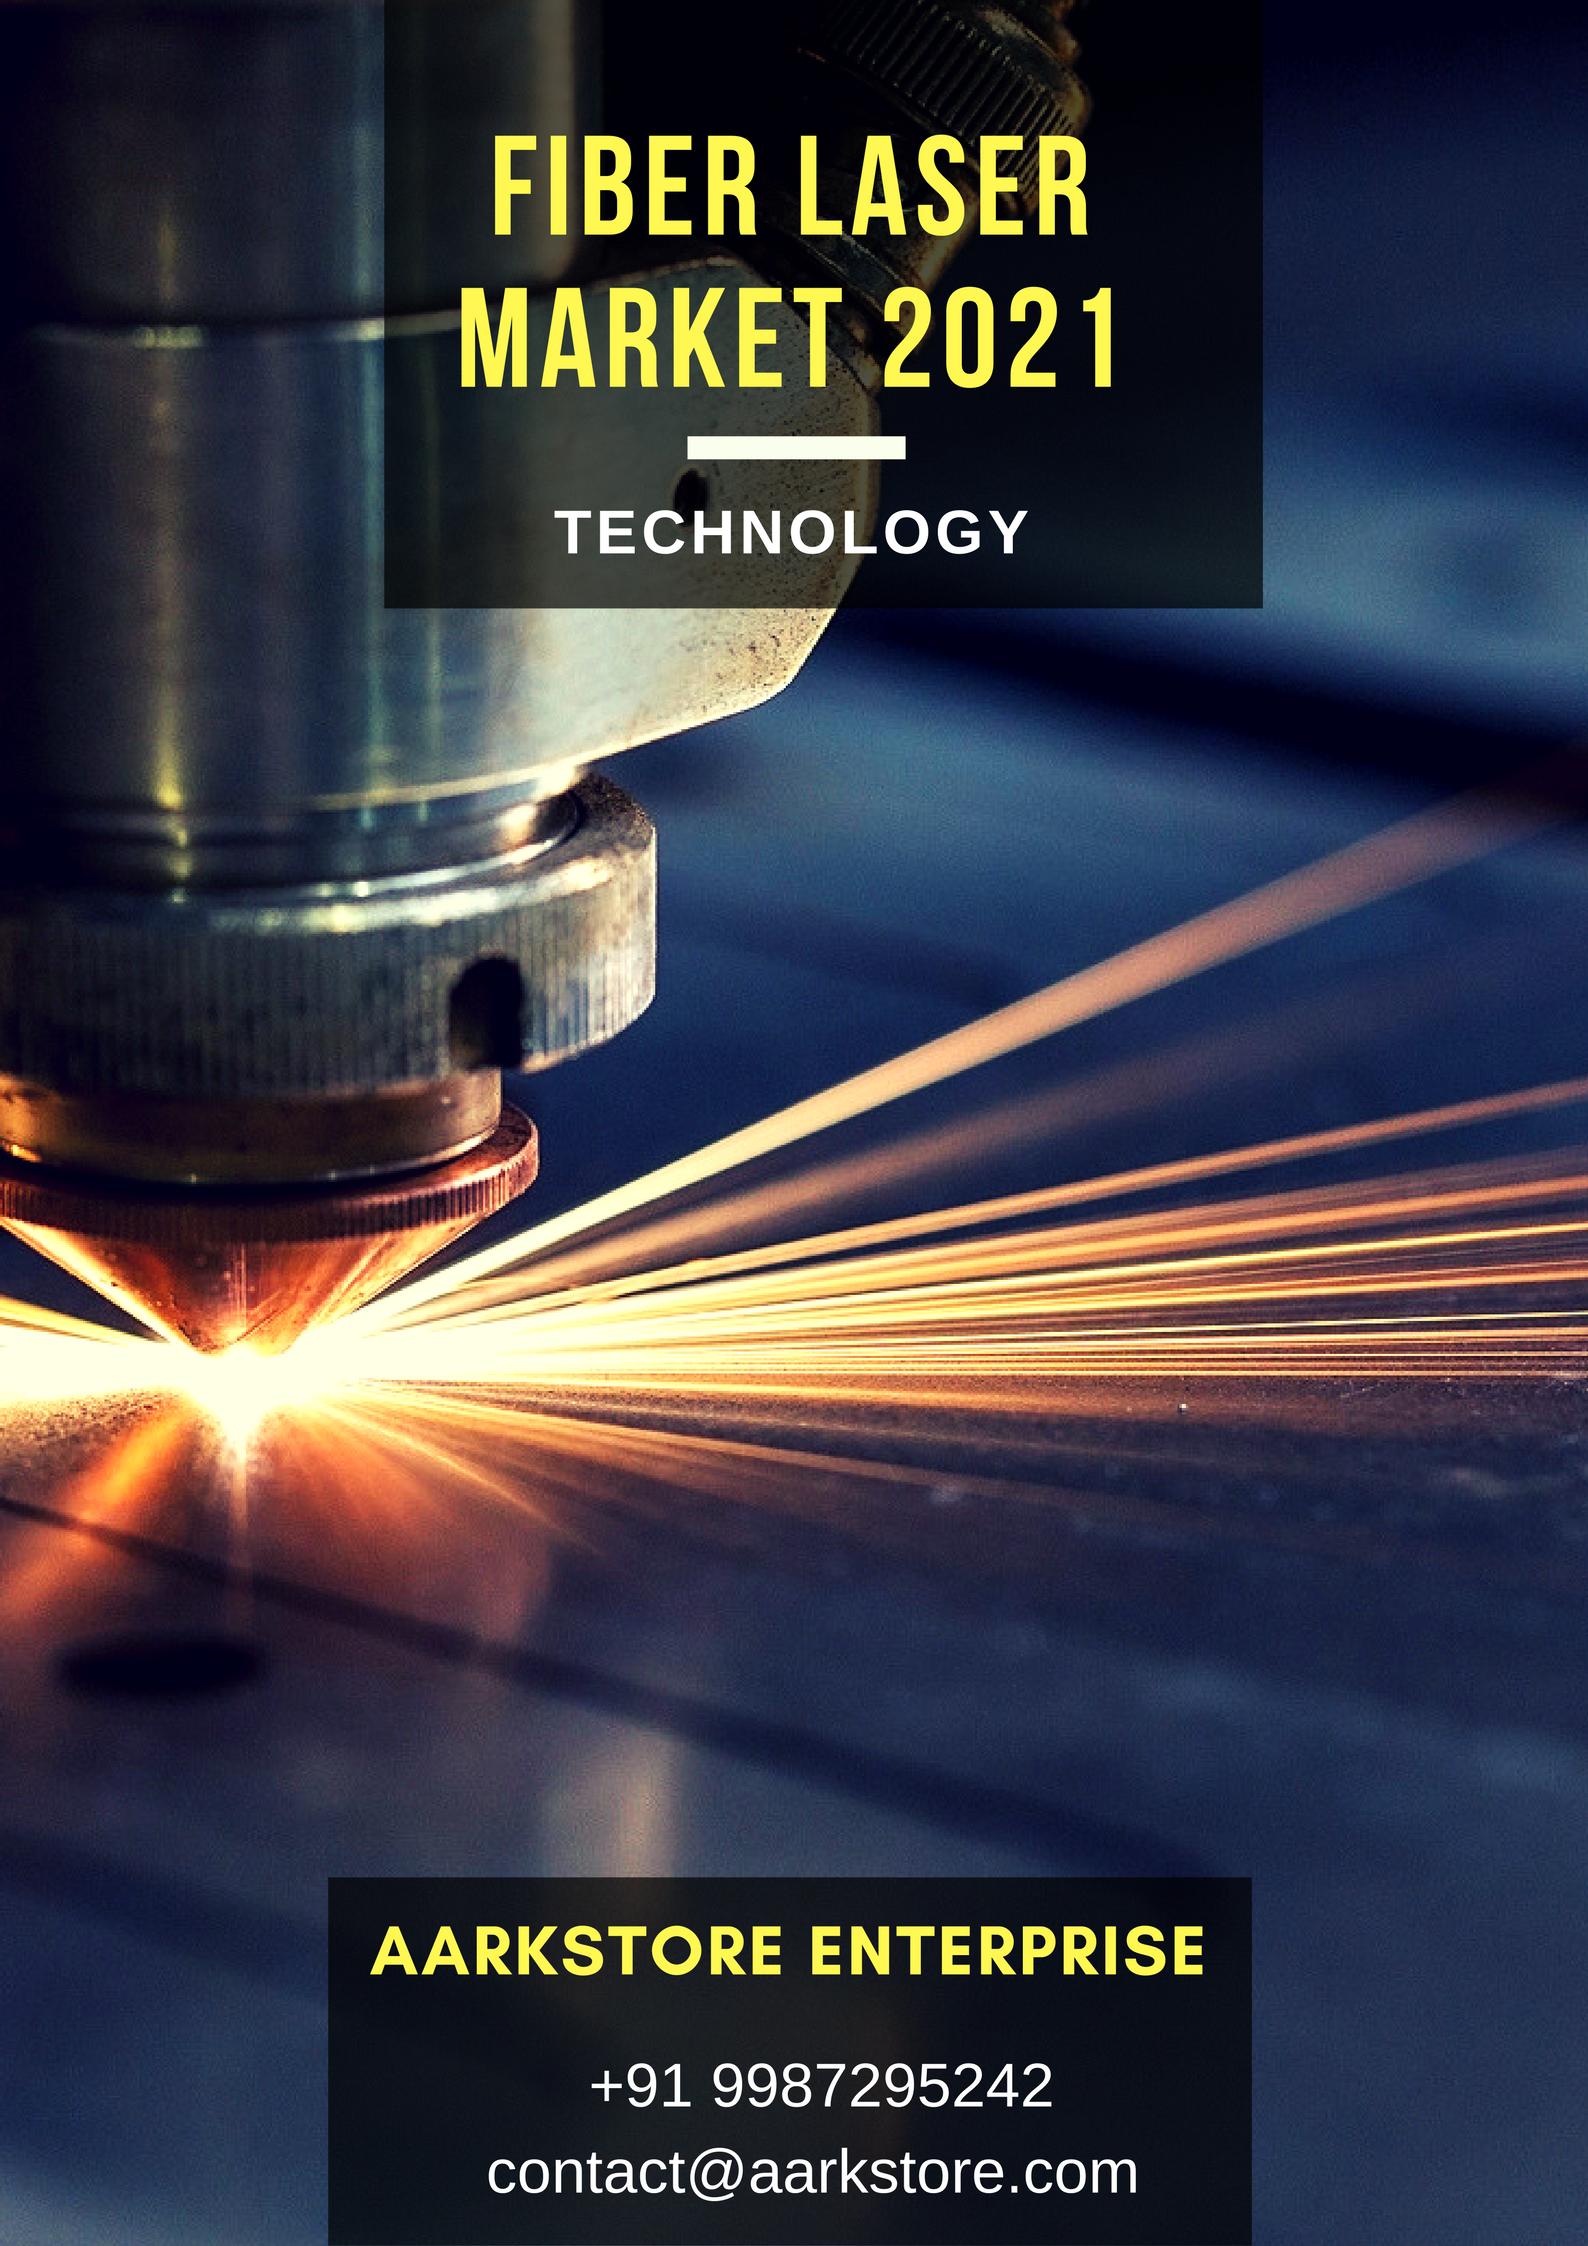 Global Fiber Laser Market Analysis & Forecast Report 2016